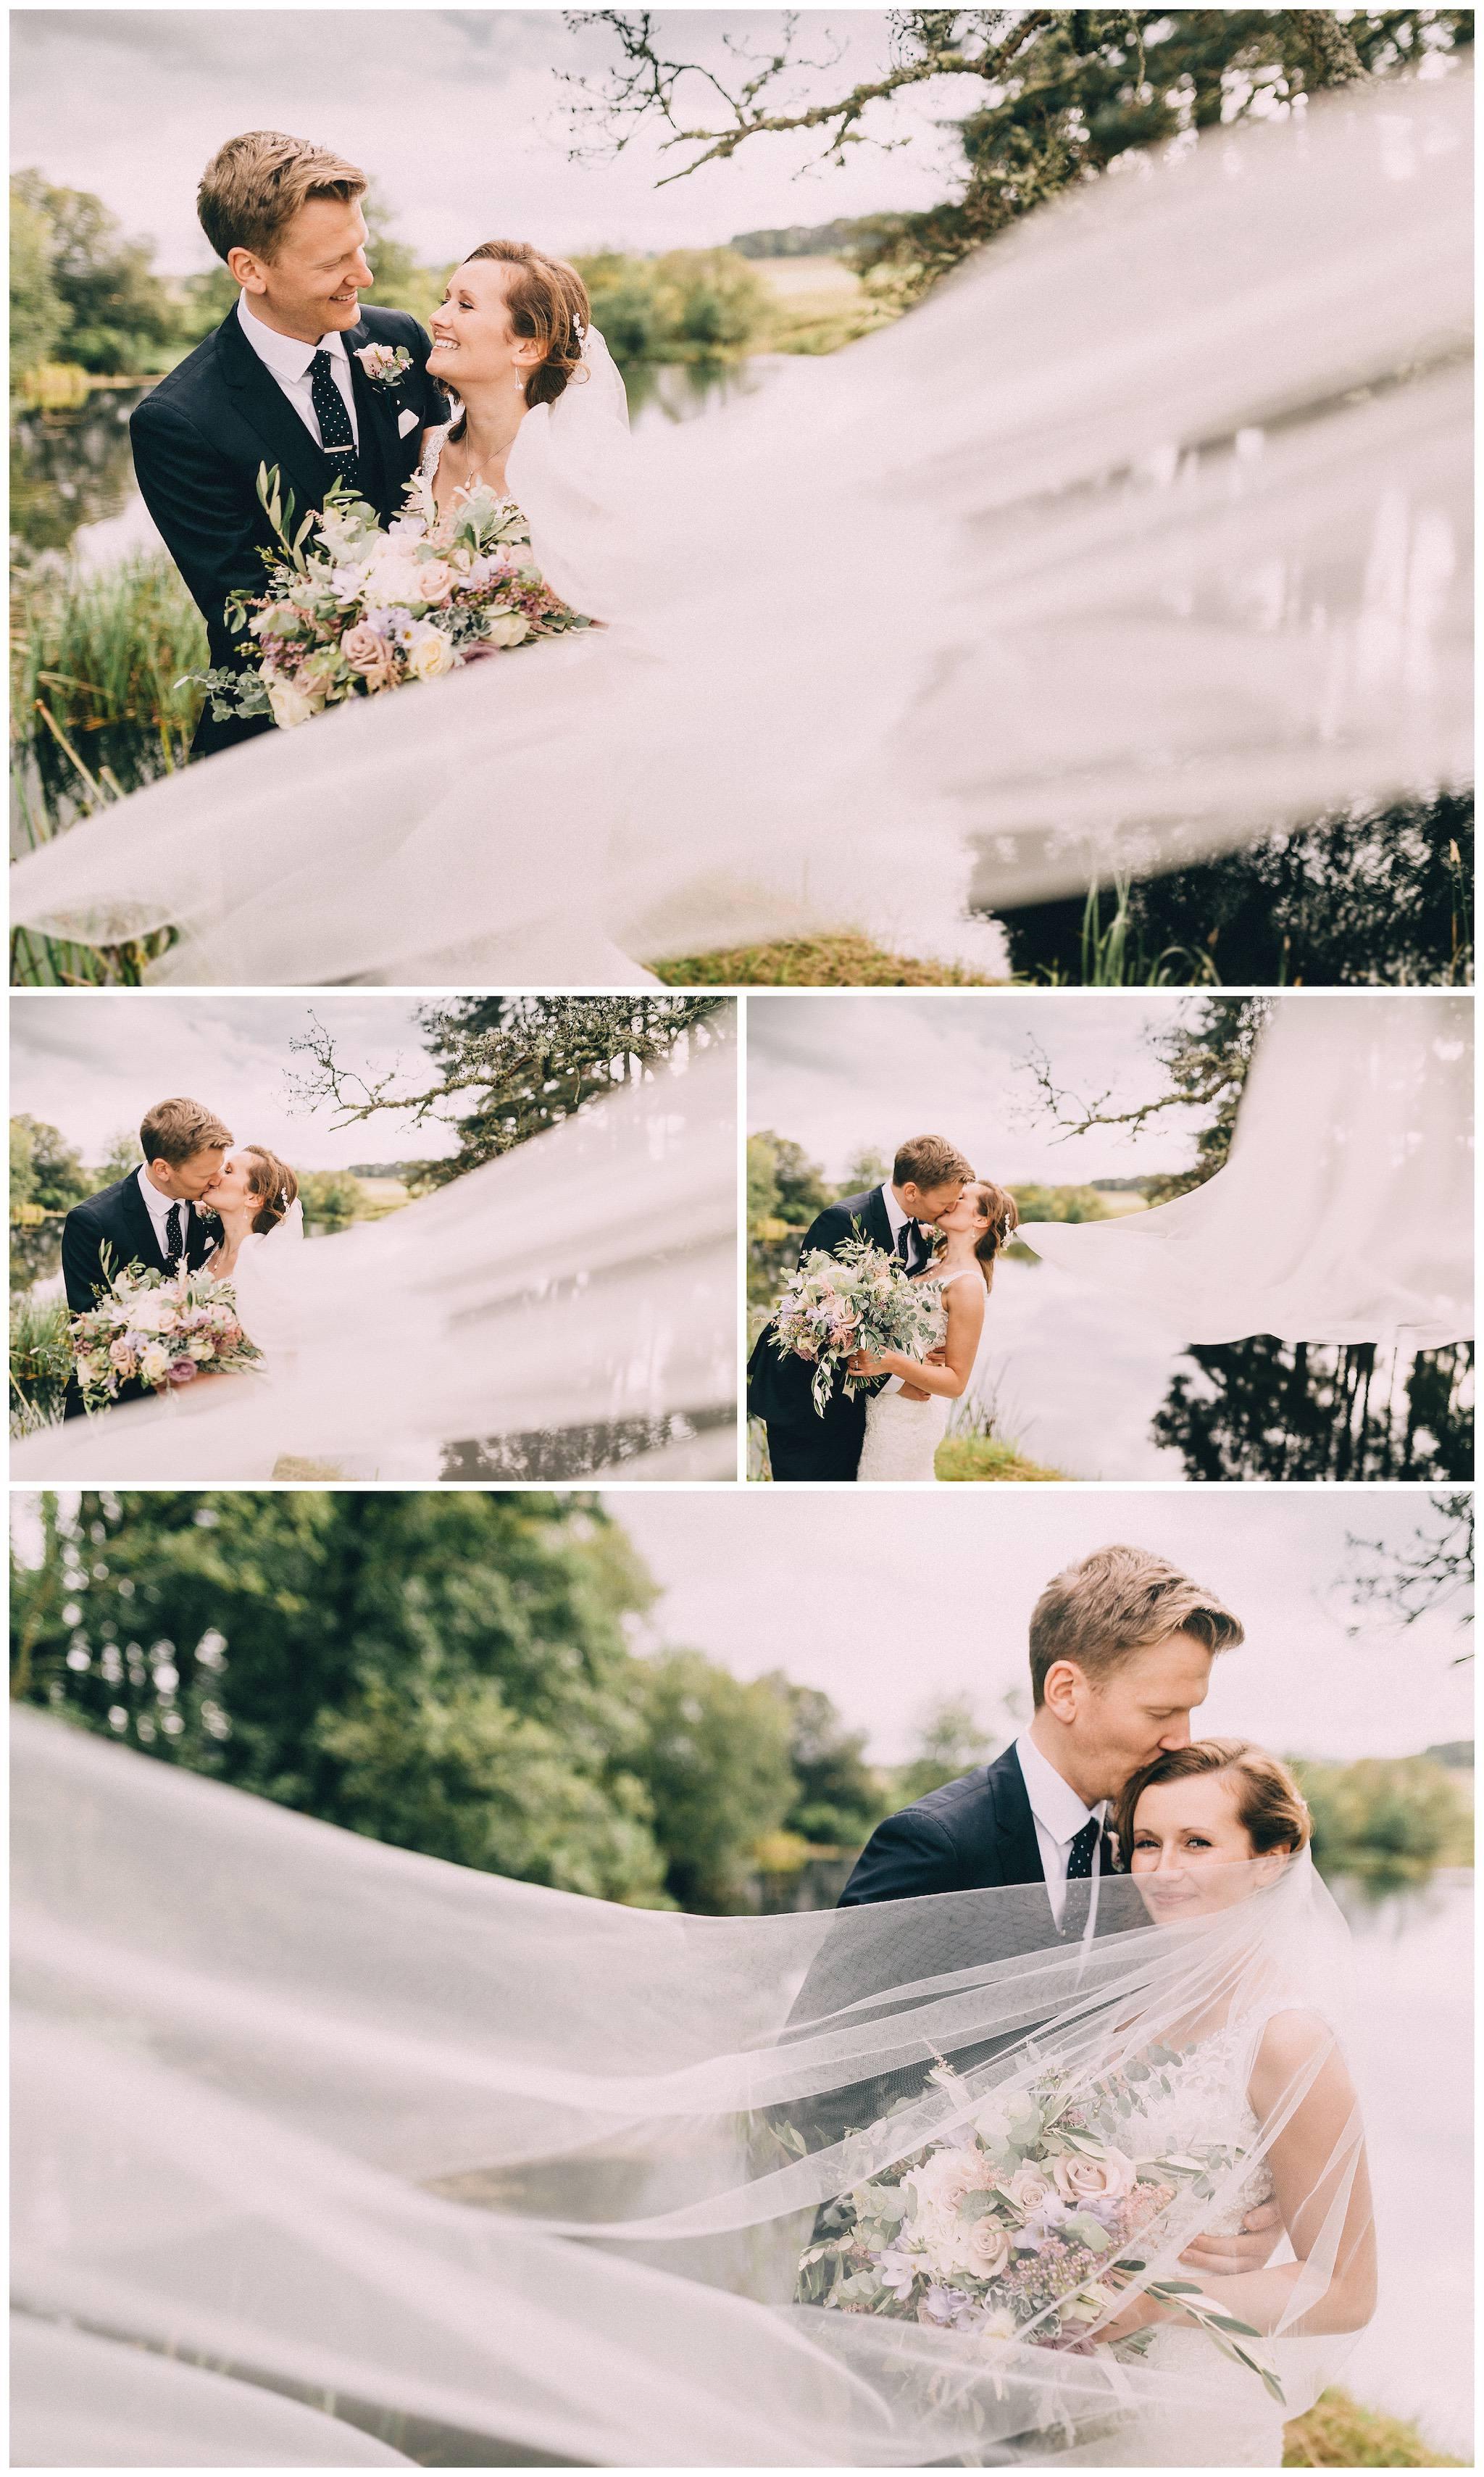 Le-Petit-Chateau-Wedding-Photographer-17.jpg